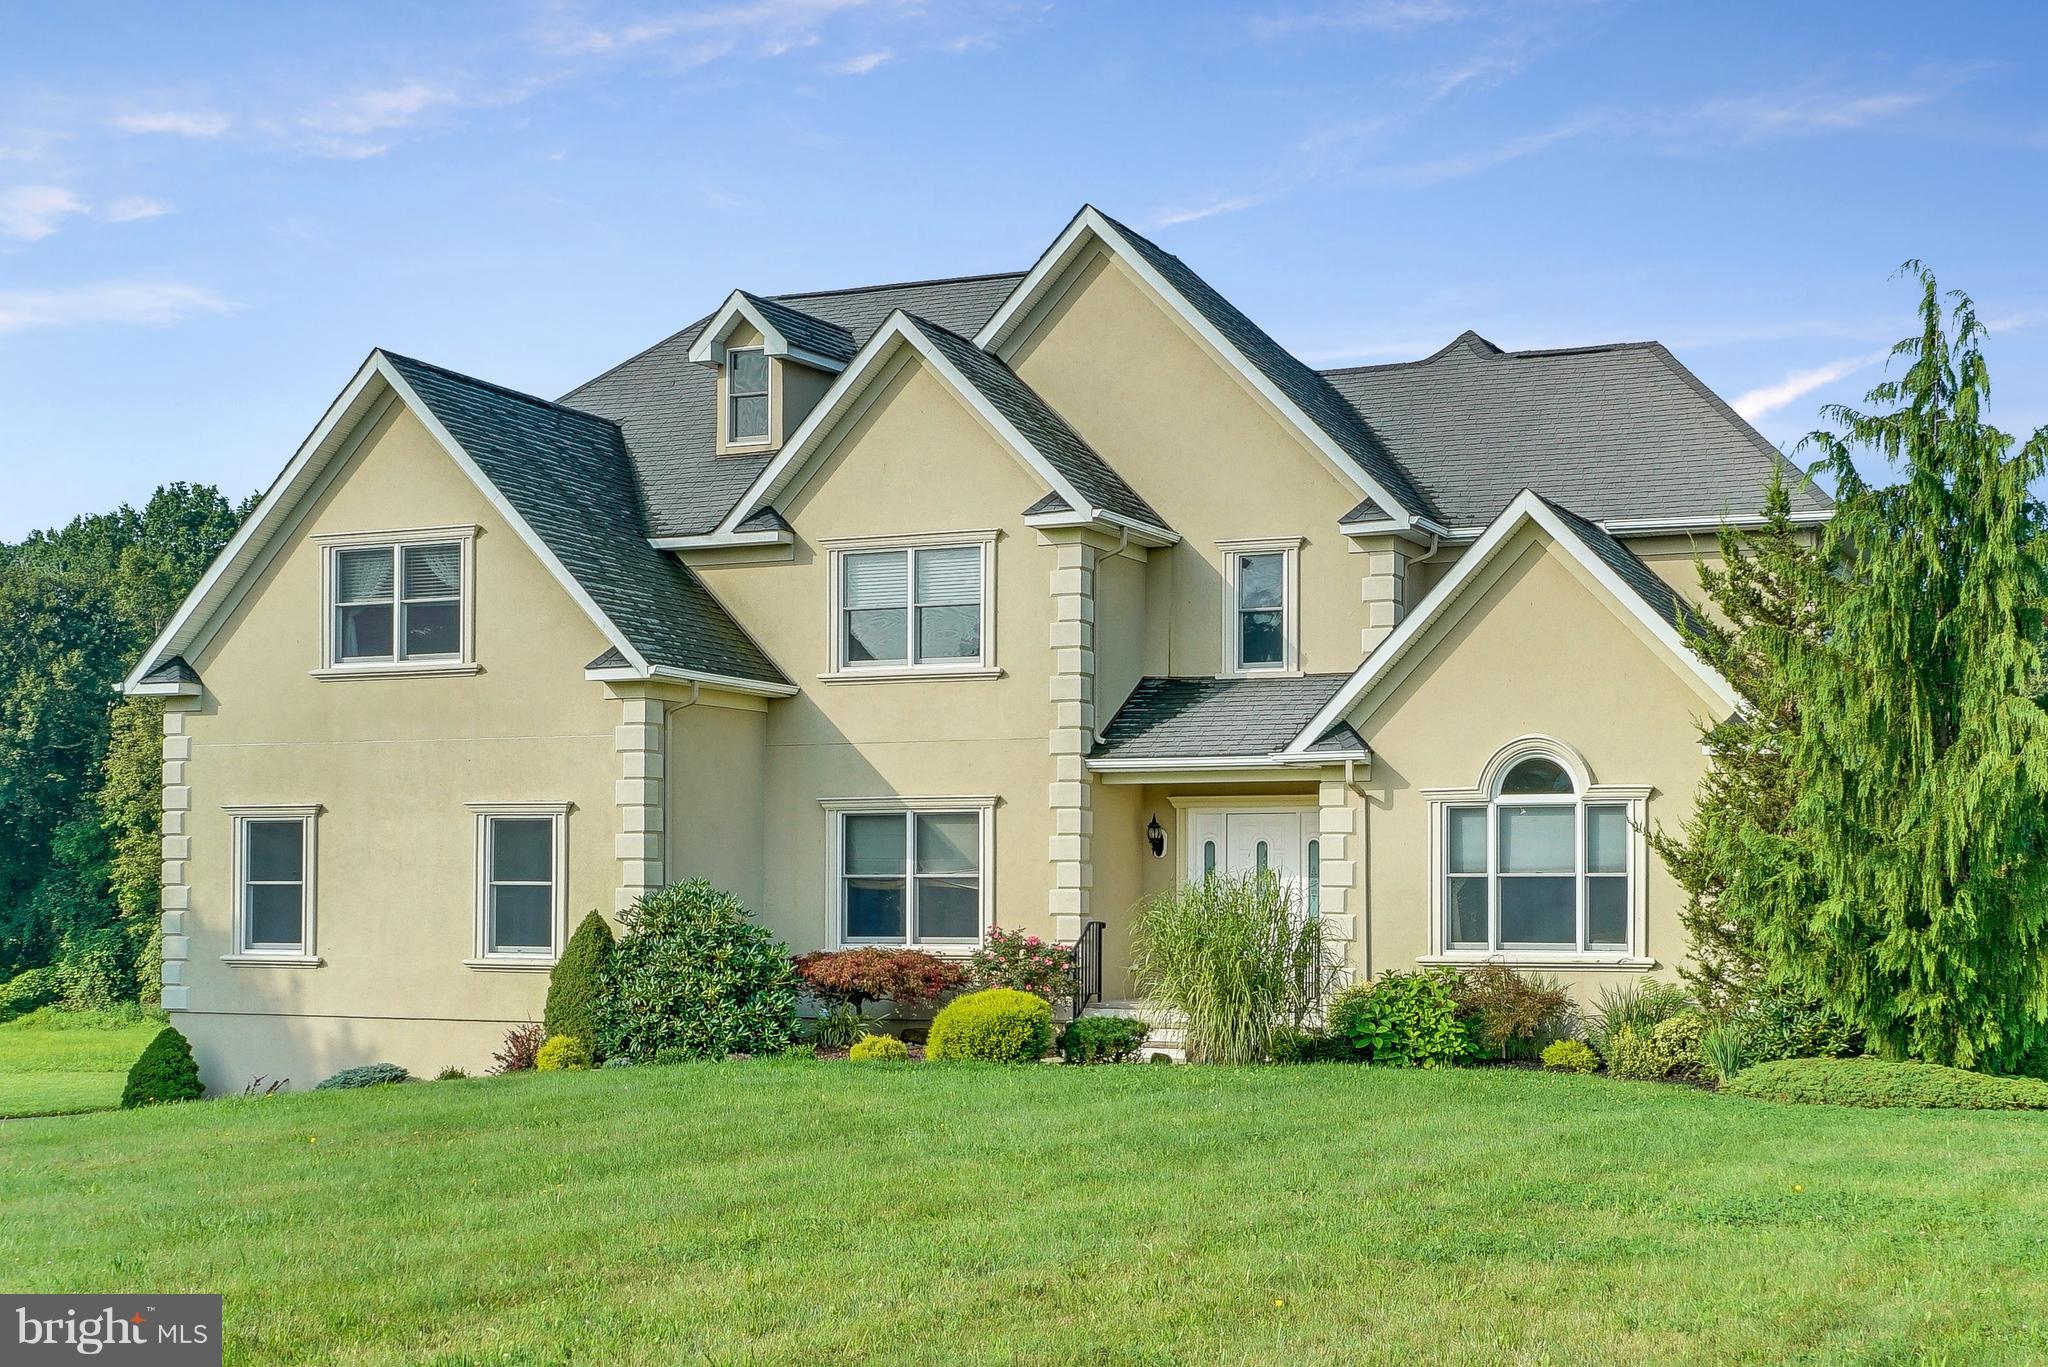 441 SCHOOLHOUSE RD, MONROE TOWNSHIP, NJ 08831